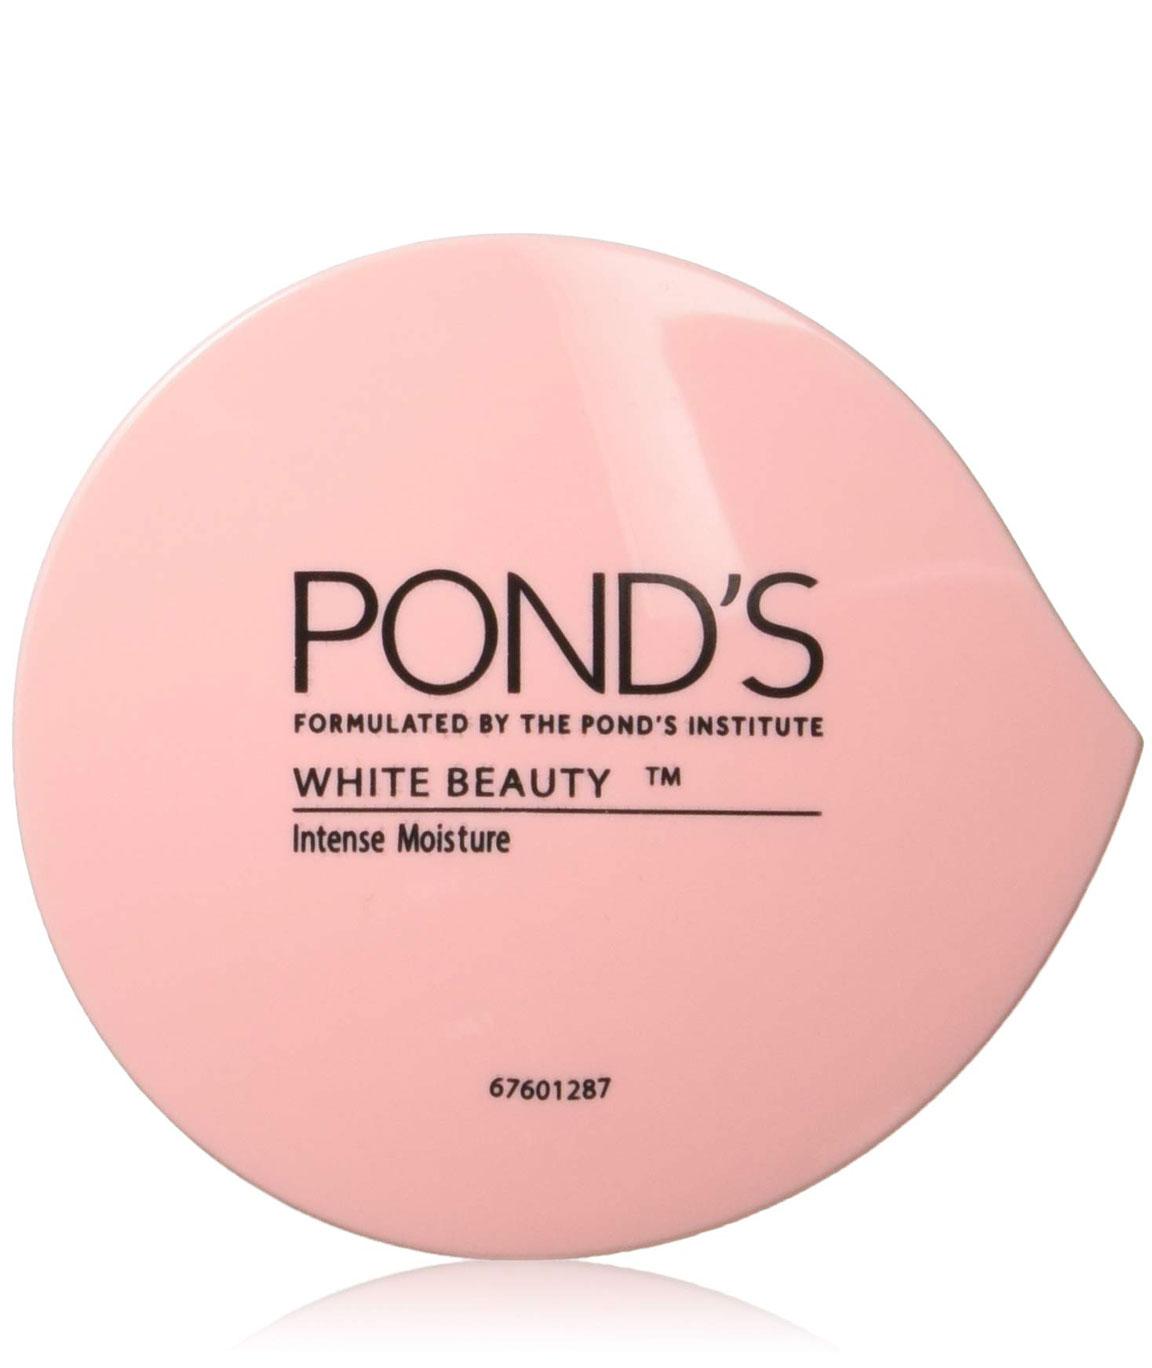 Ponds White Beauty Spotless Softness Day Cream, 35gm